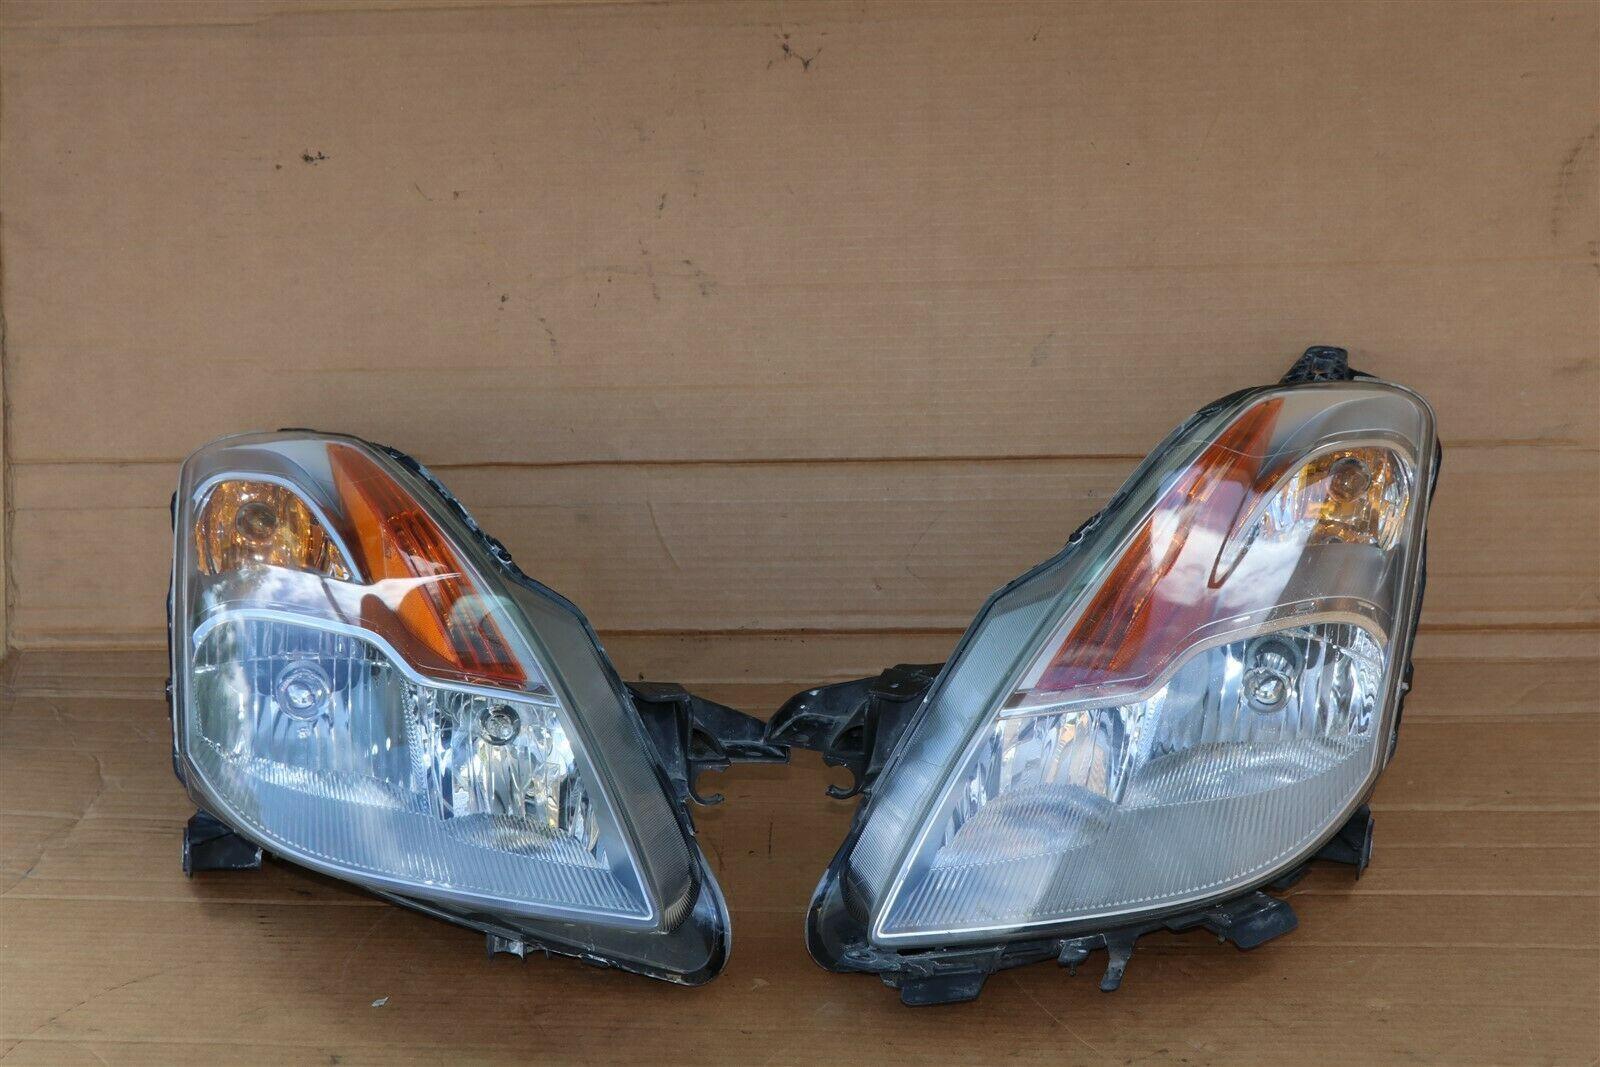 08-09 Nissan Altima 3.5 Coupe Xenon Headlight Head Light Lamps Set L&R POLISHED